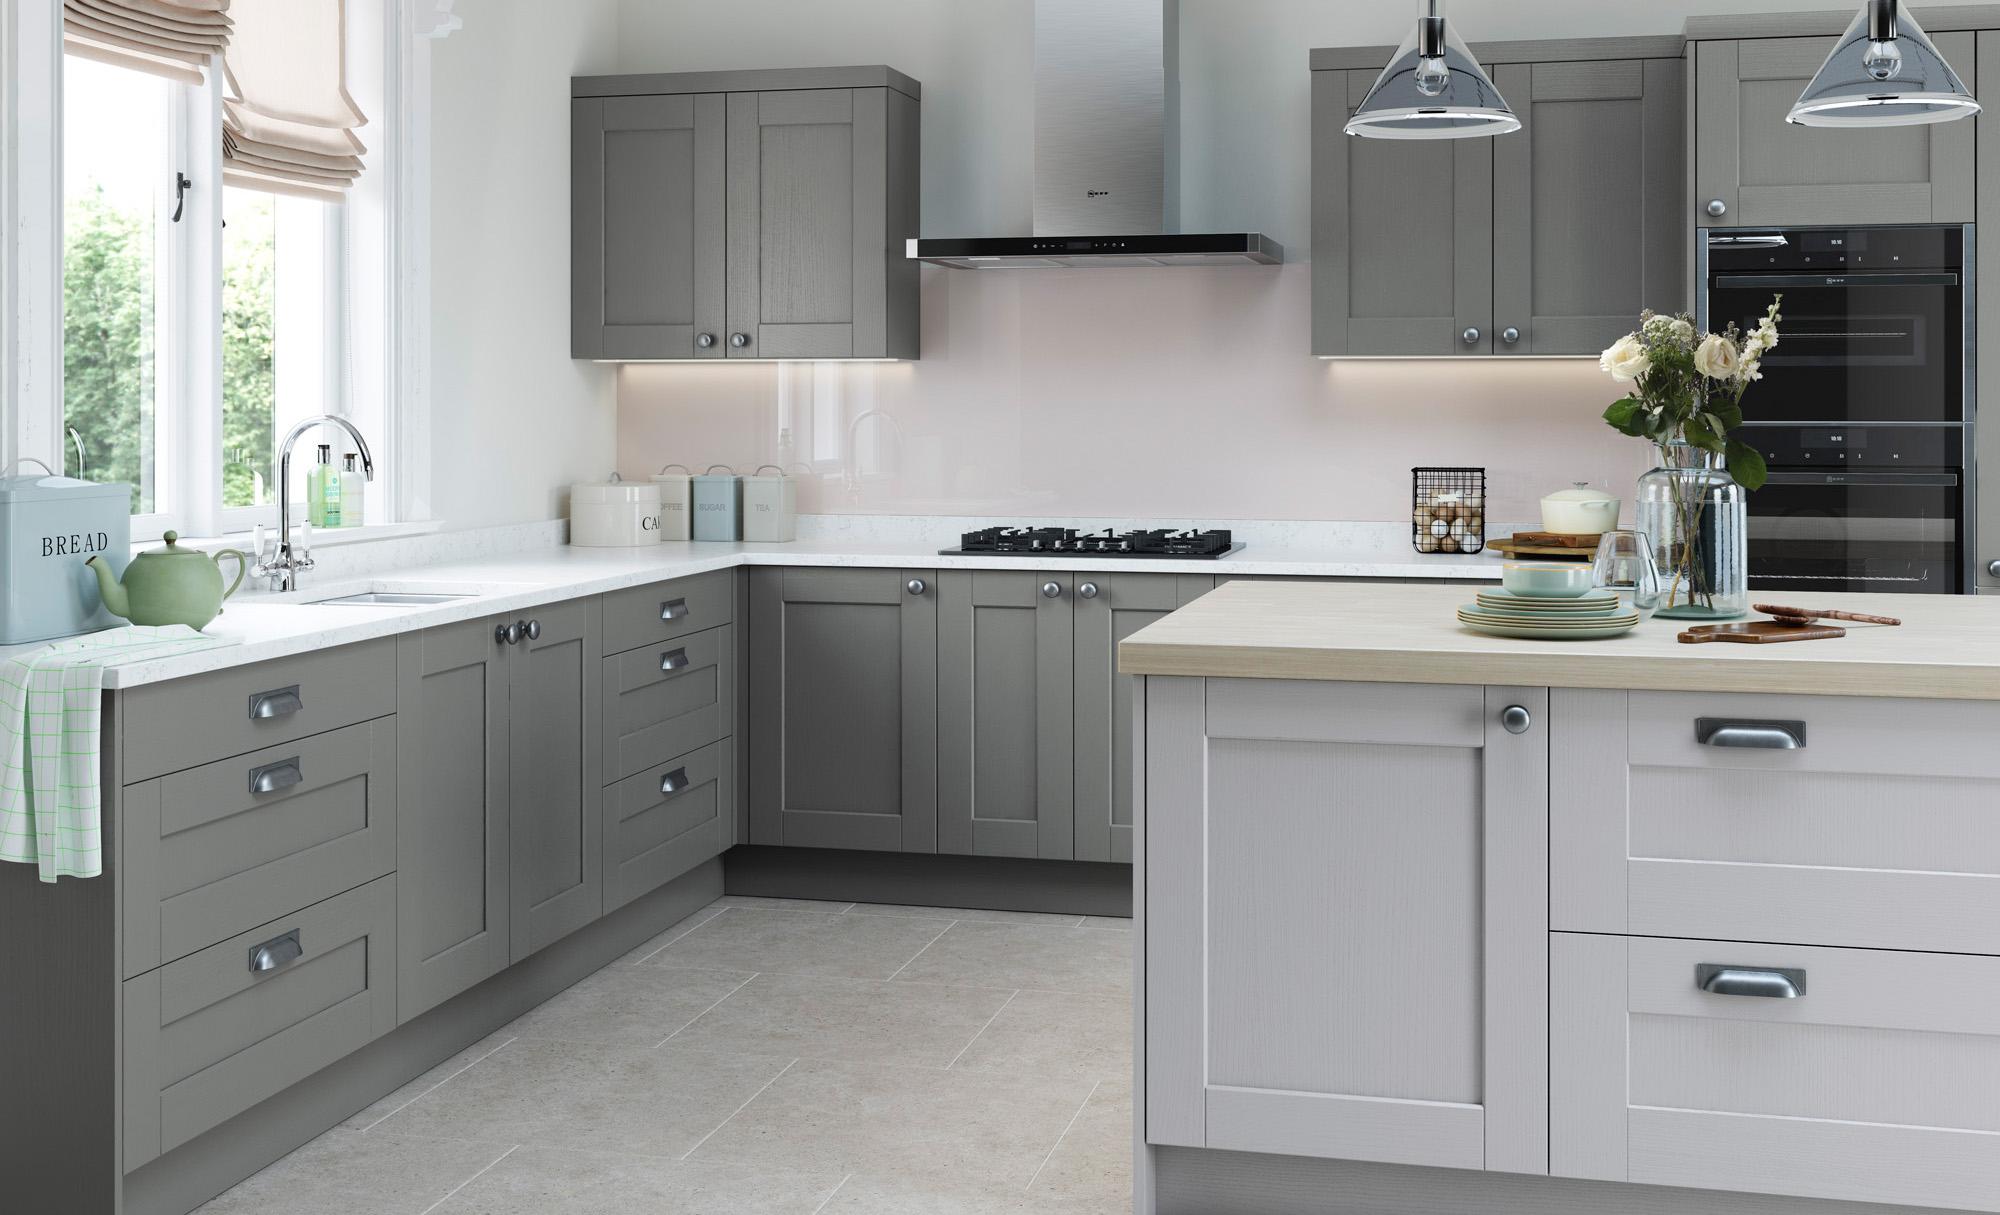 shaker style kitchen contemporary cabinets chicago doors kensington classic uform light grey dust